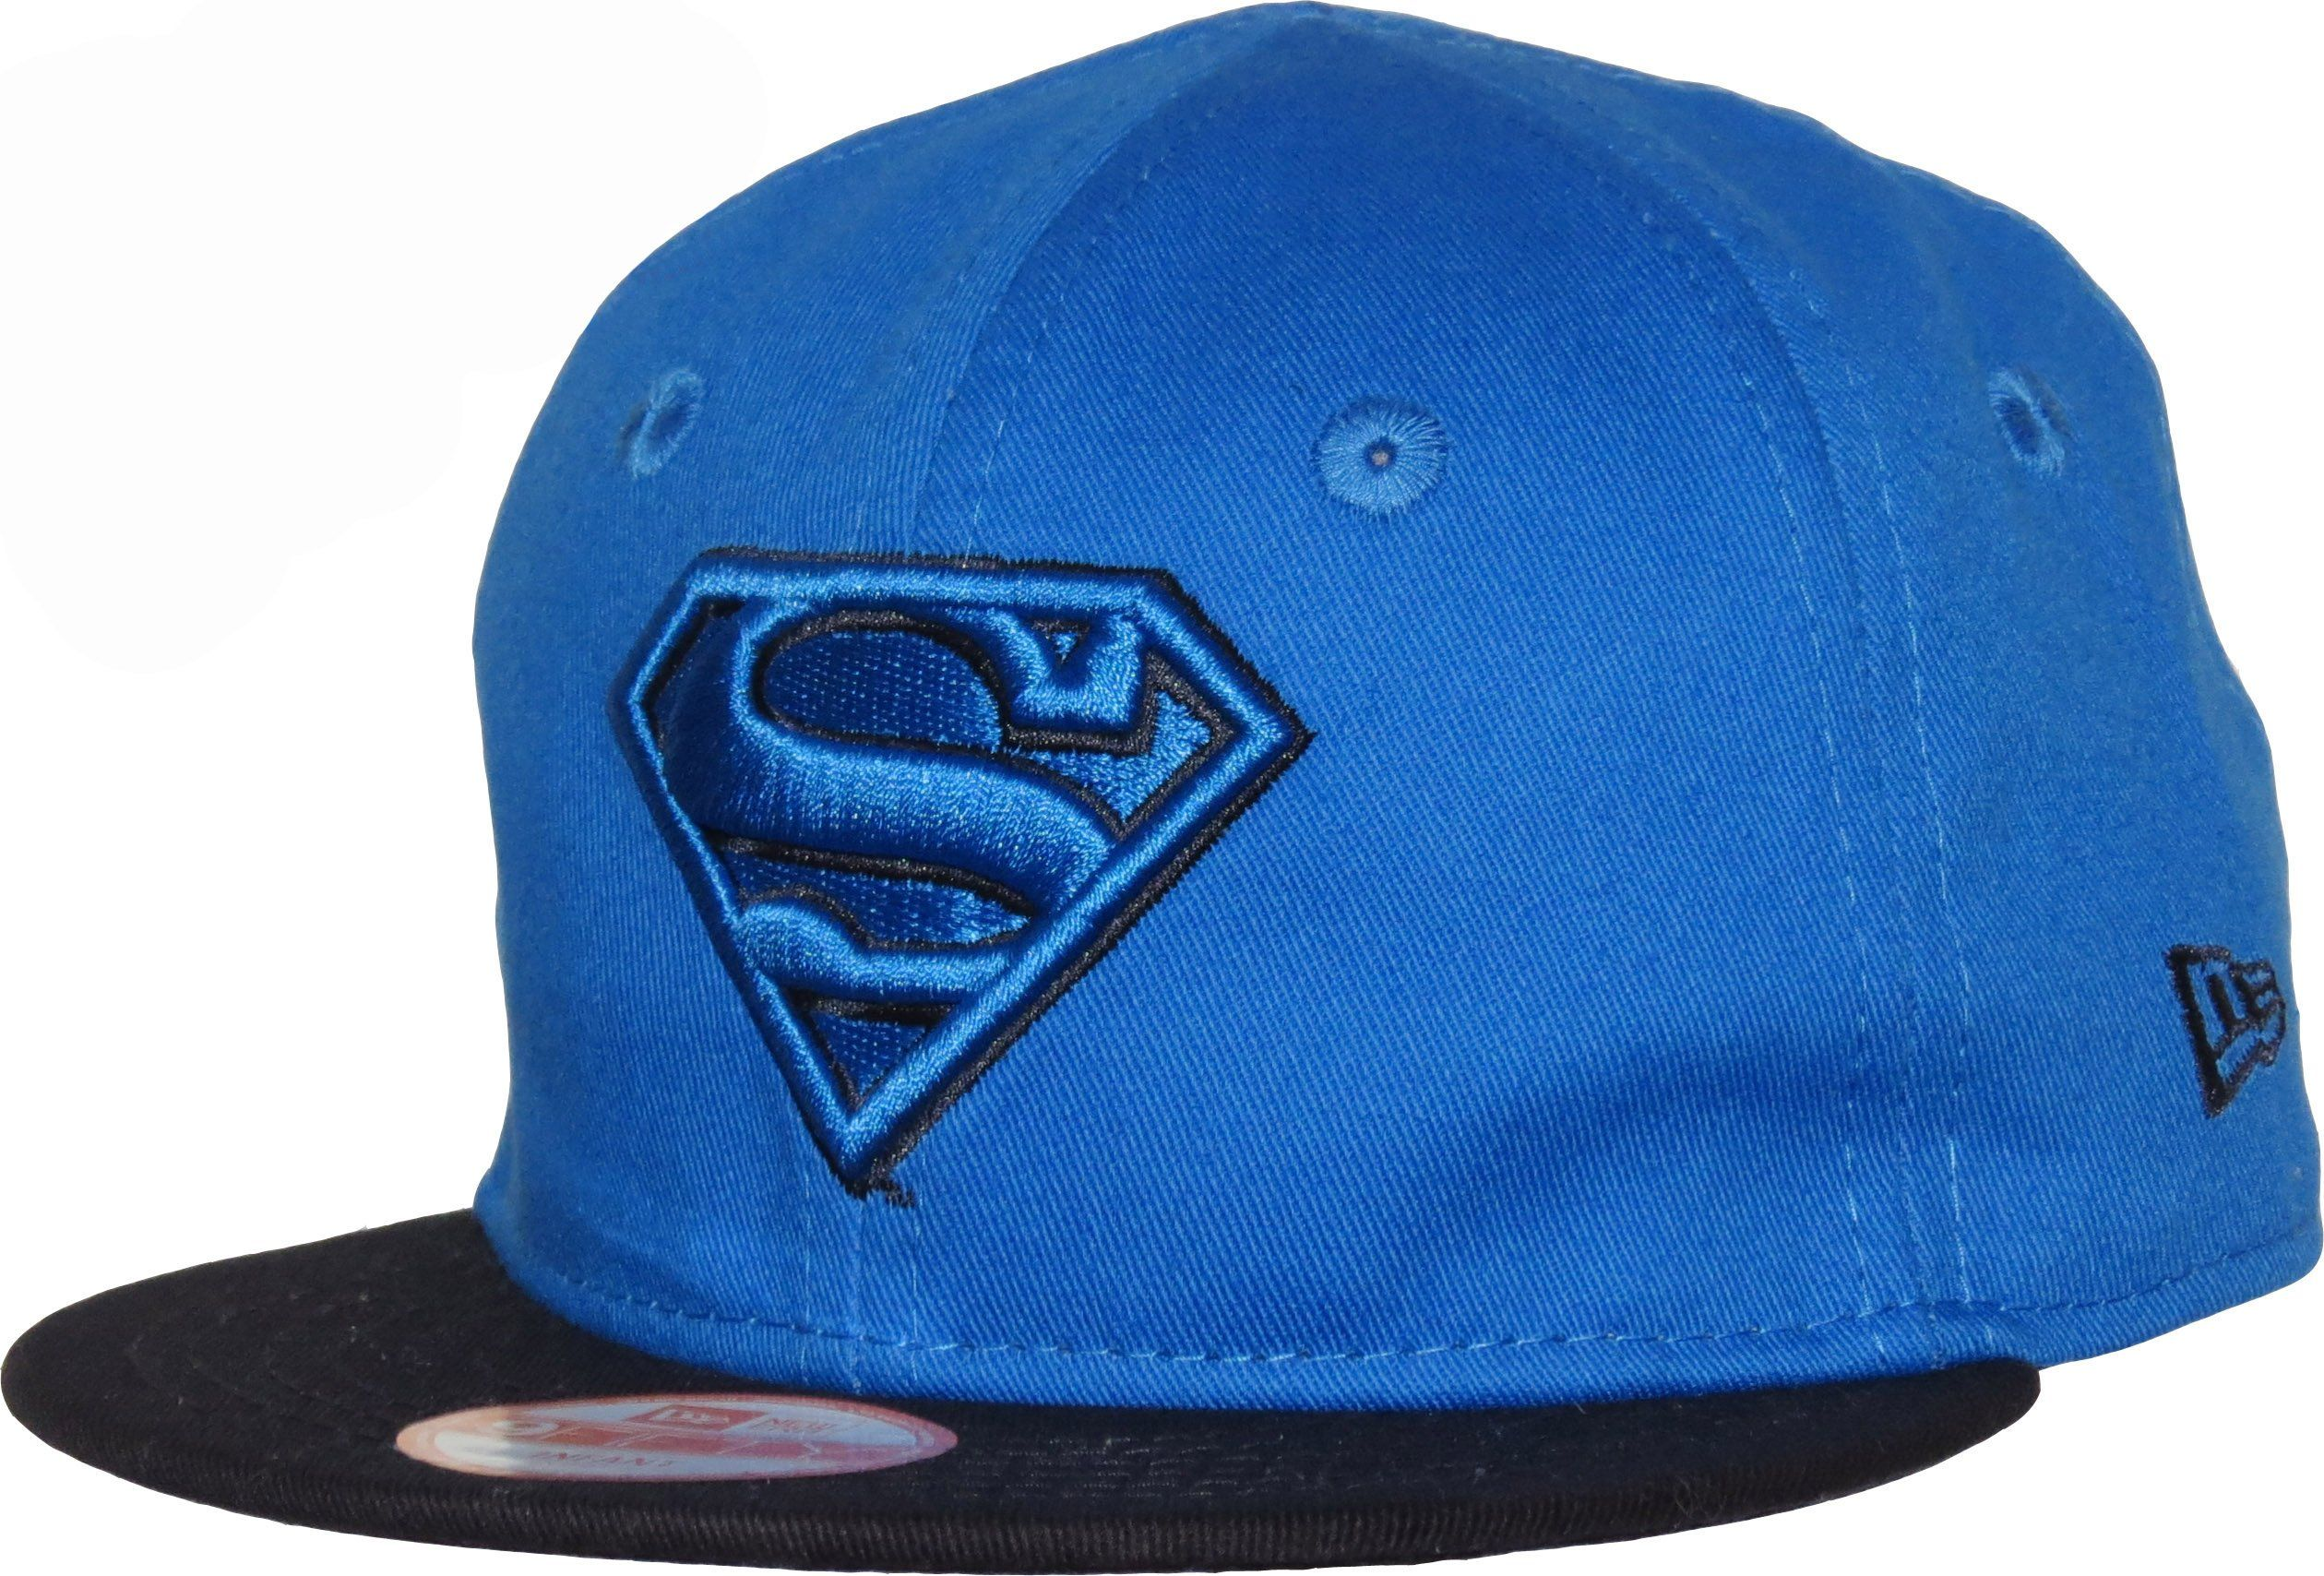 2003d4a706d Superman New Era 950 Infants Blue Snapback Cap ( 0 - 2 years old ...